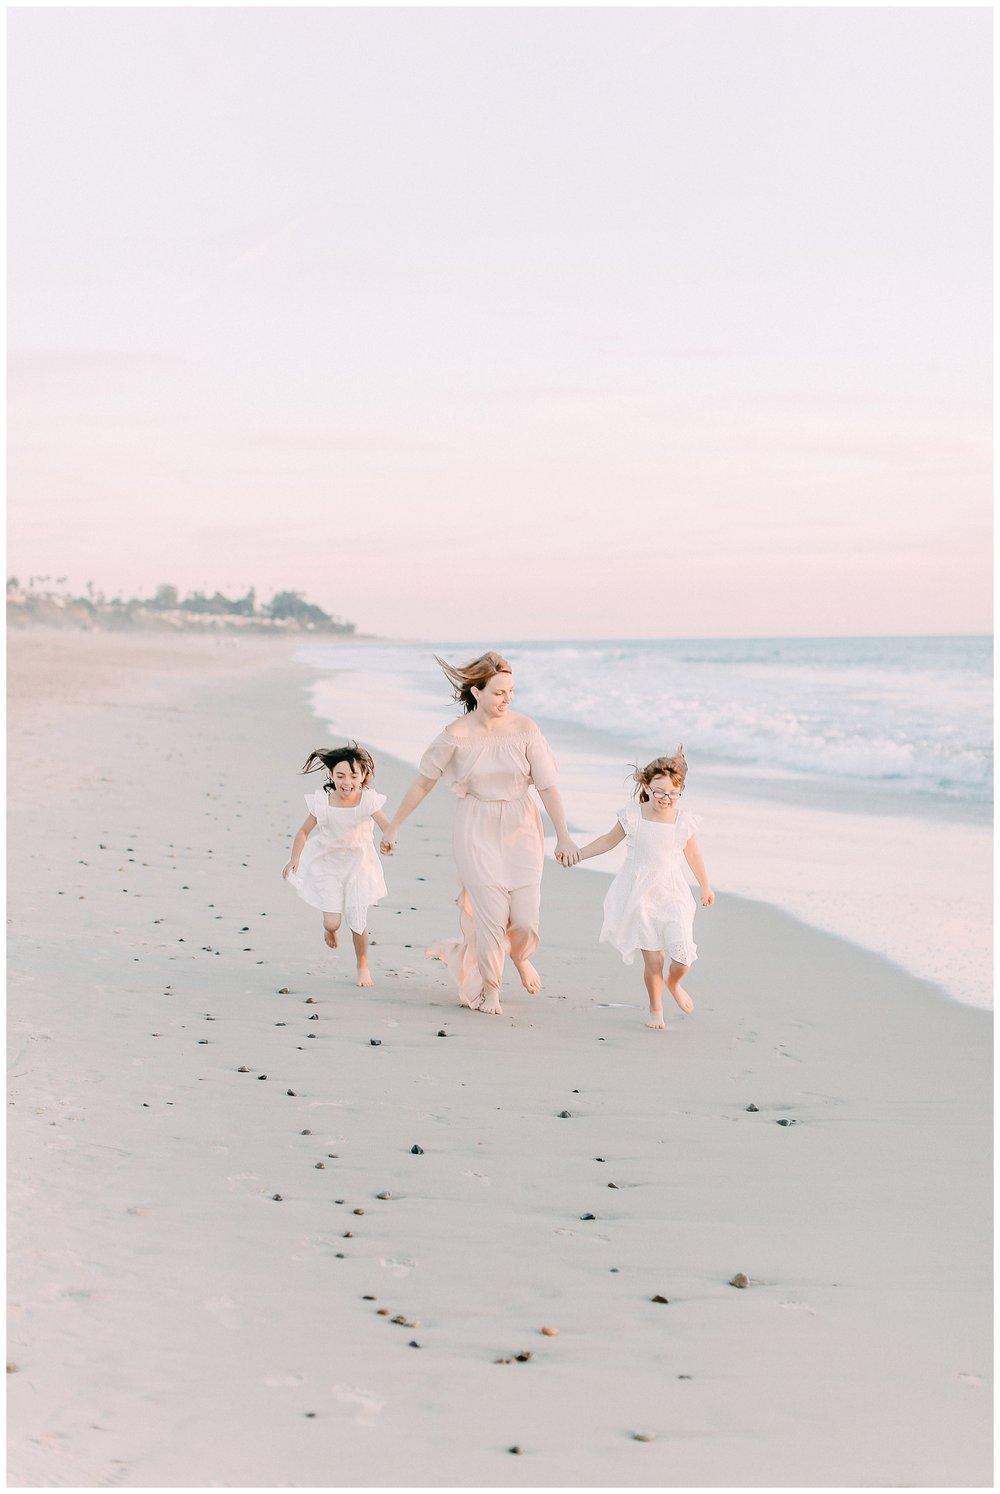 San_clemente_family_session_Orange_county_family_photographer_cori_kleckner_photography_laguna_beach_family_session_0700.jpg